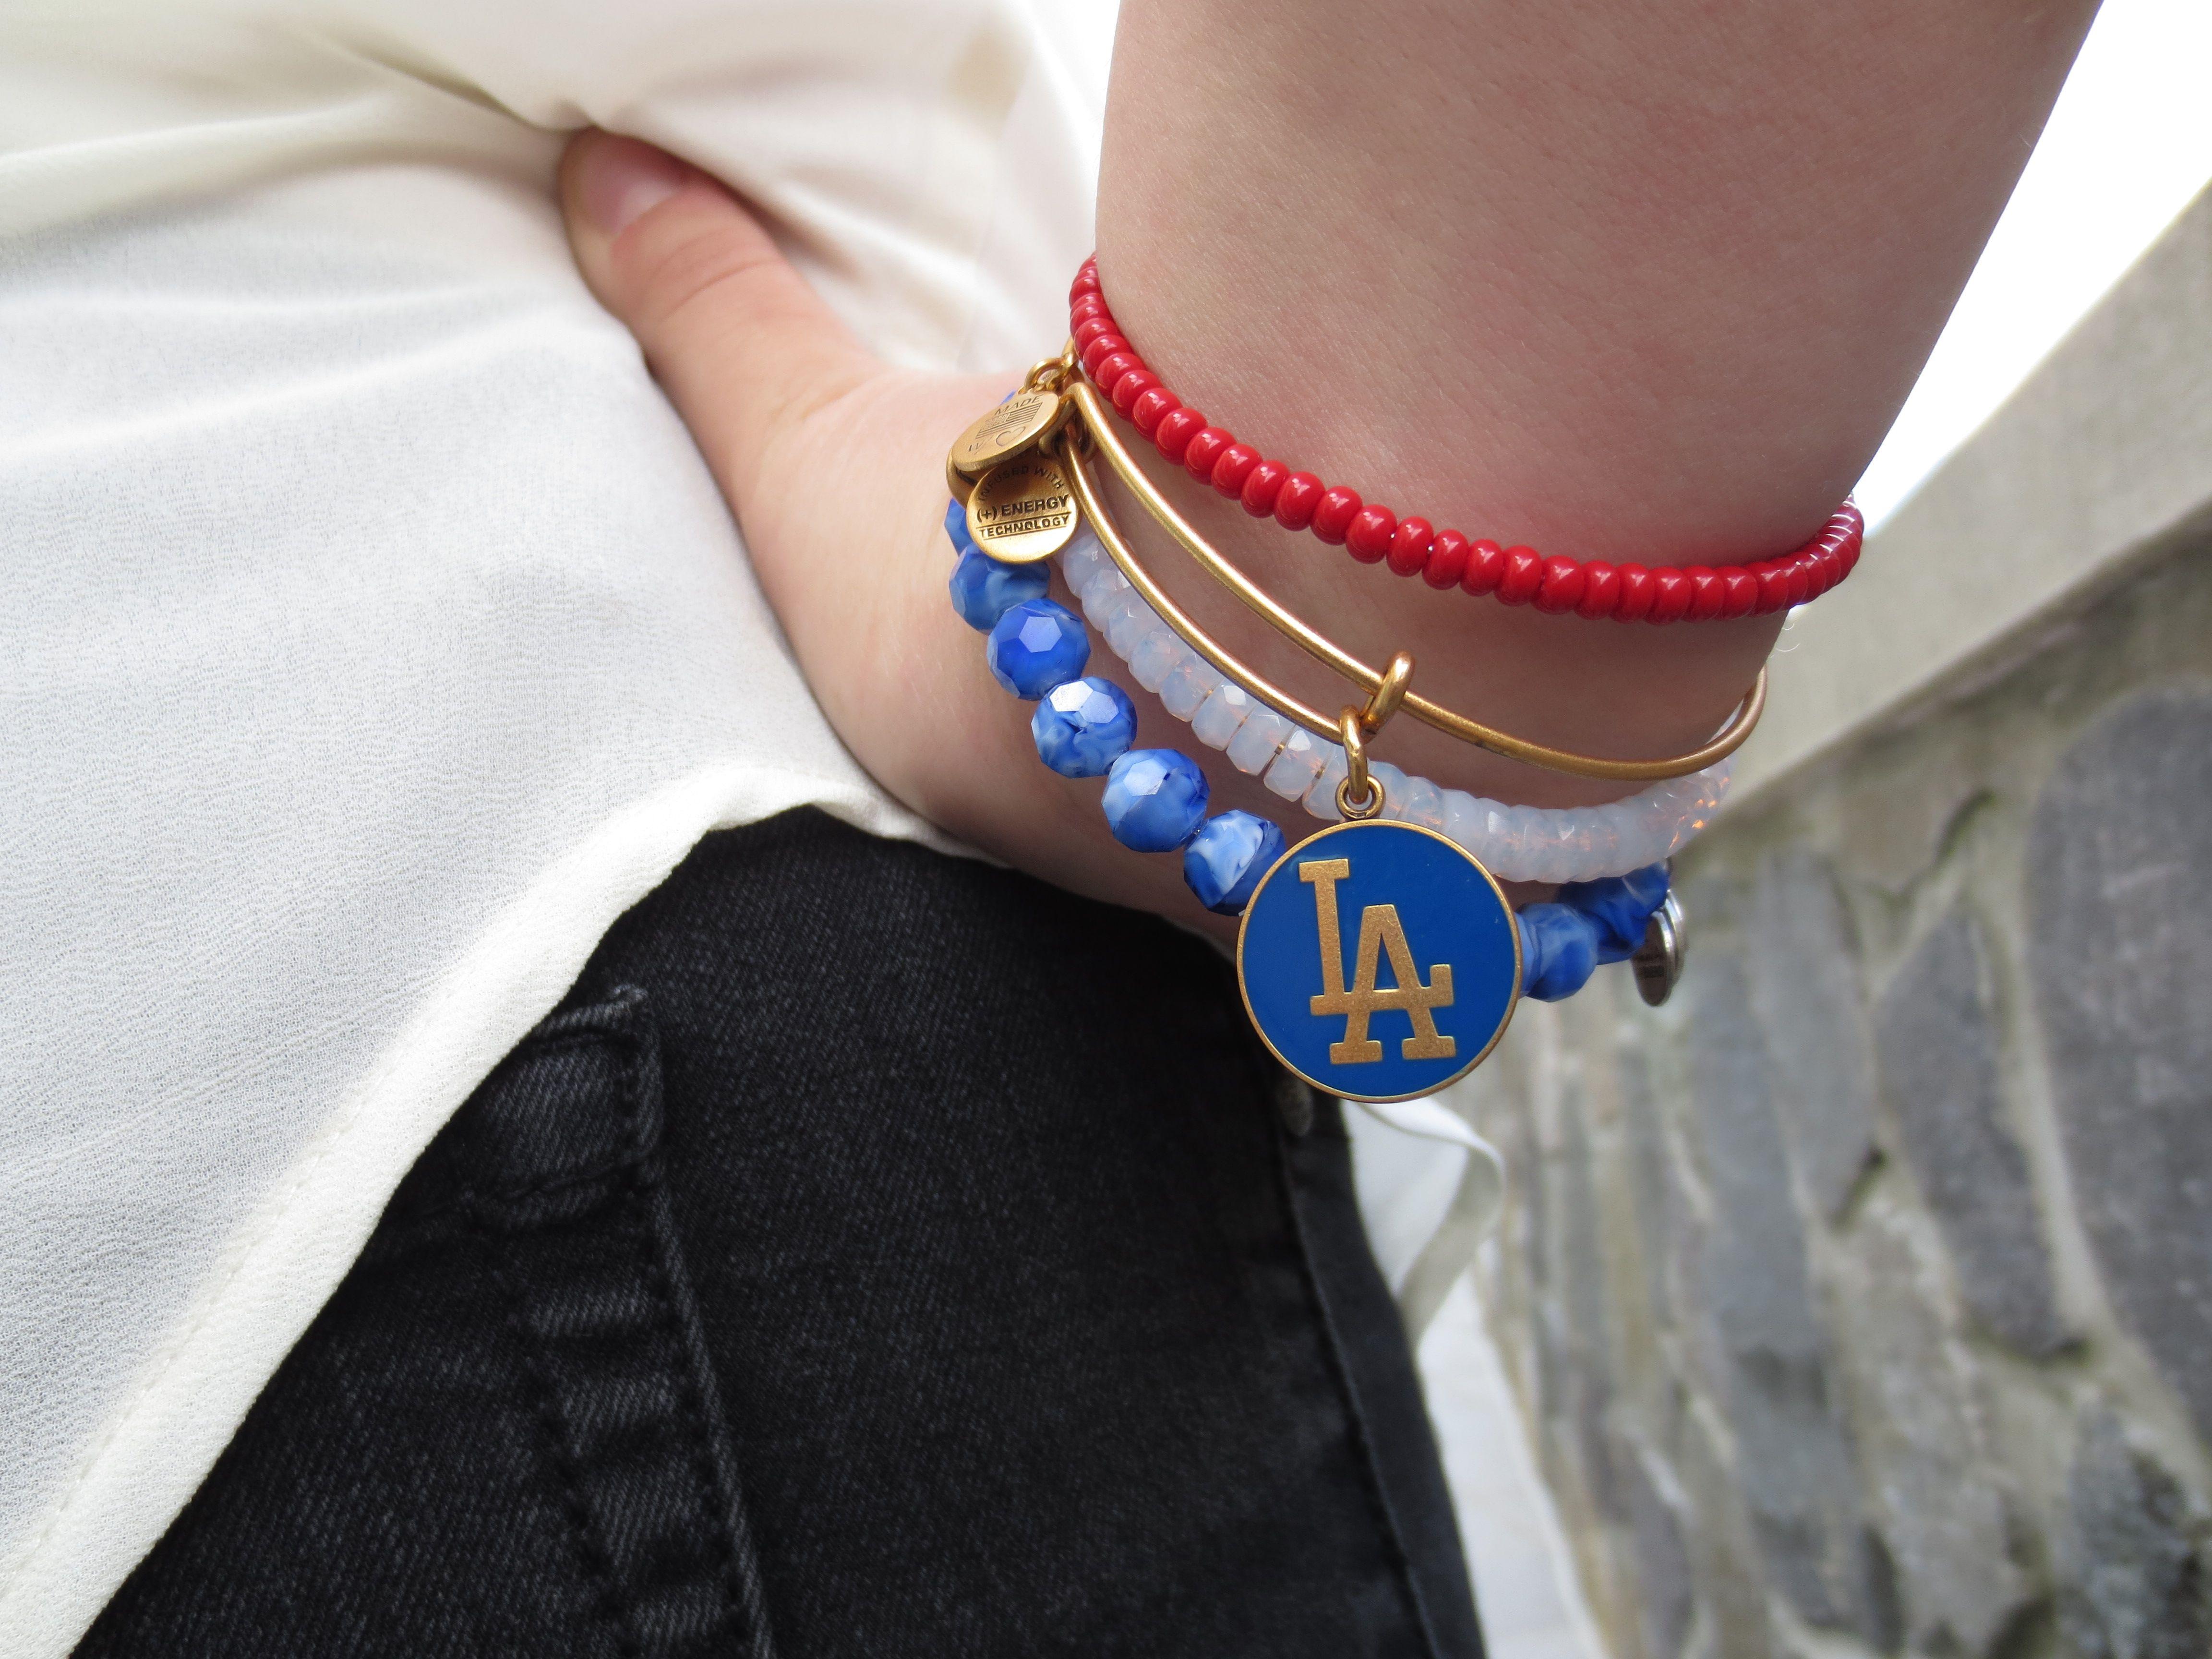 MLB LA Dodgers Dodgers, Dodgers girl, La dodgers